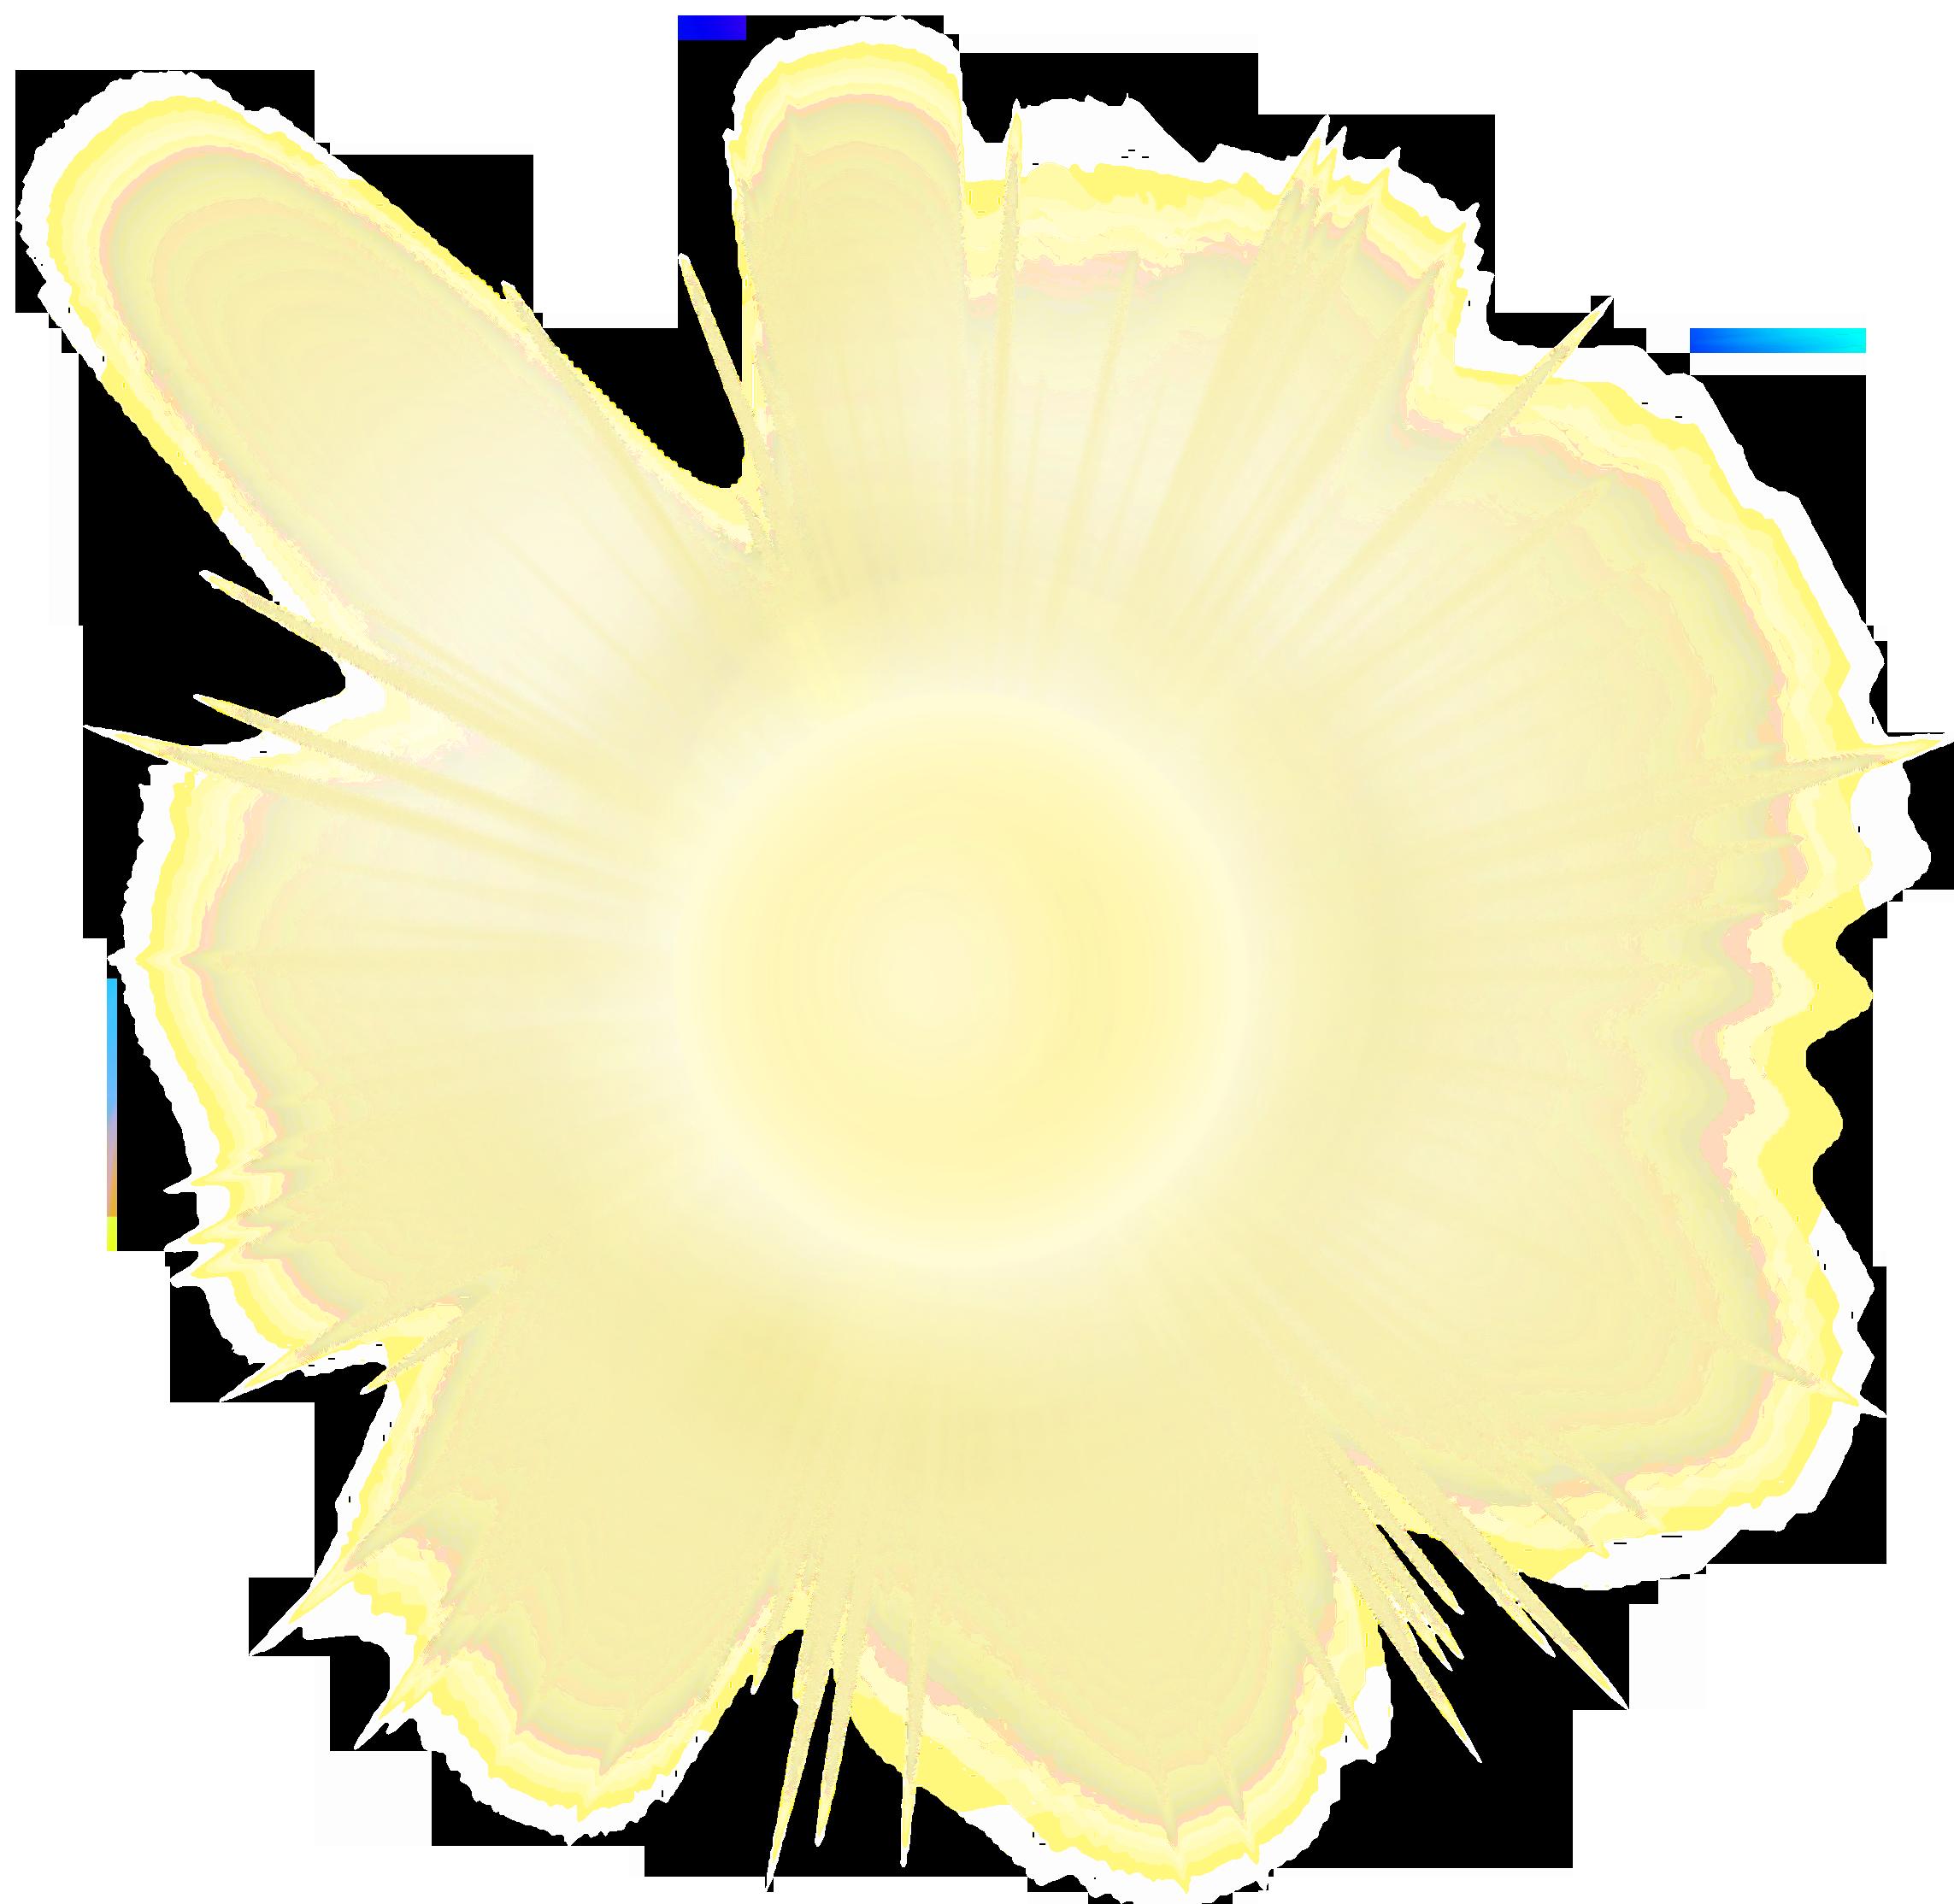 Transparent realistic sun.